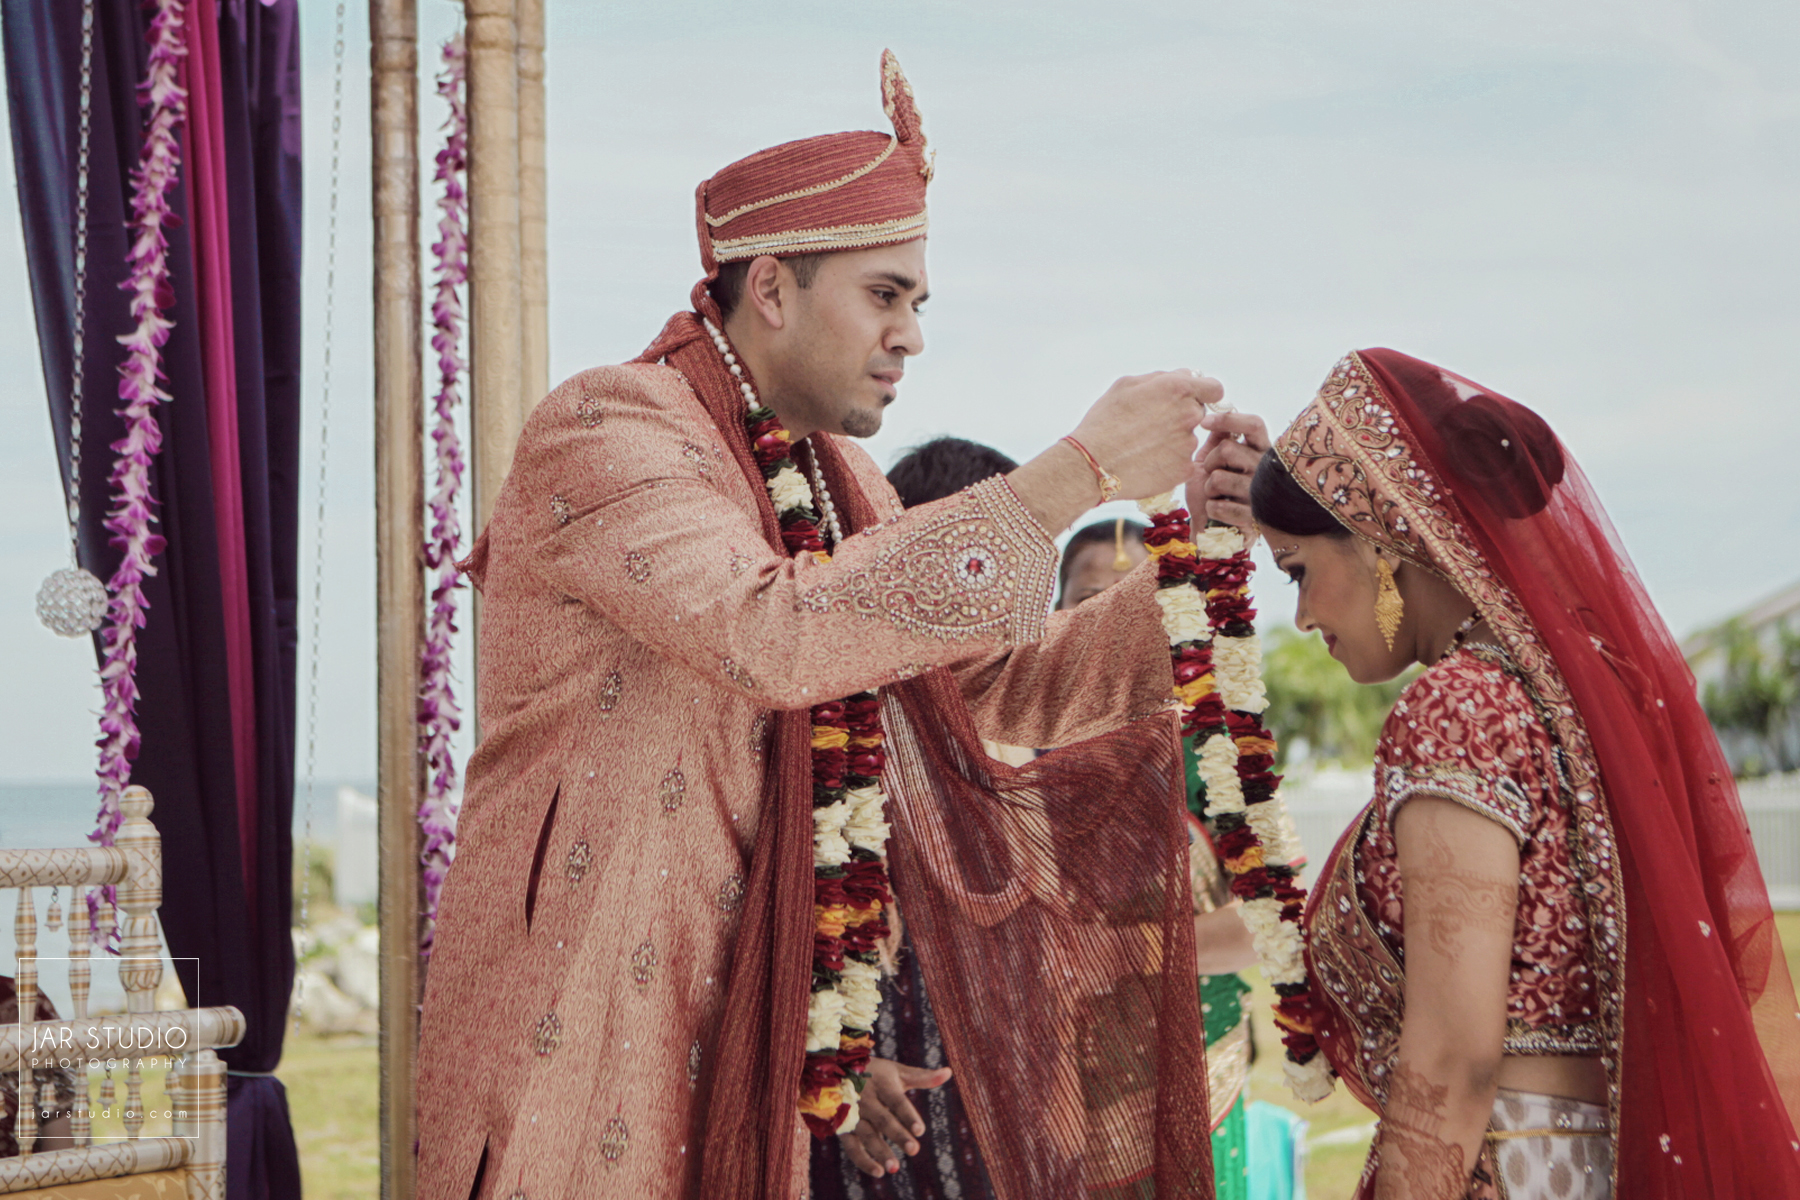 39-mangalsutra-garland-indian-wedding-jarstudio-photography-orlando-fl.JPG